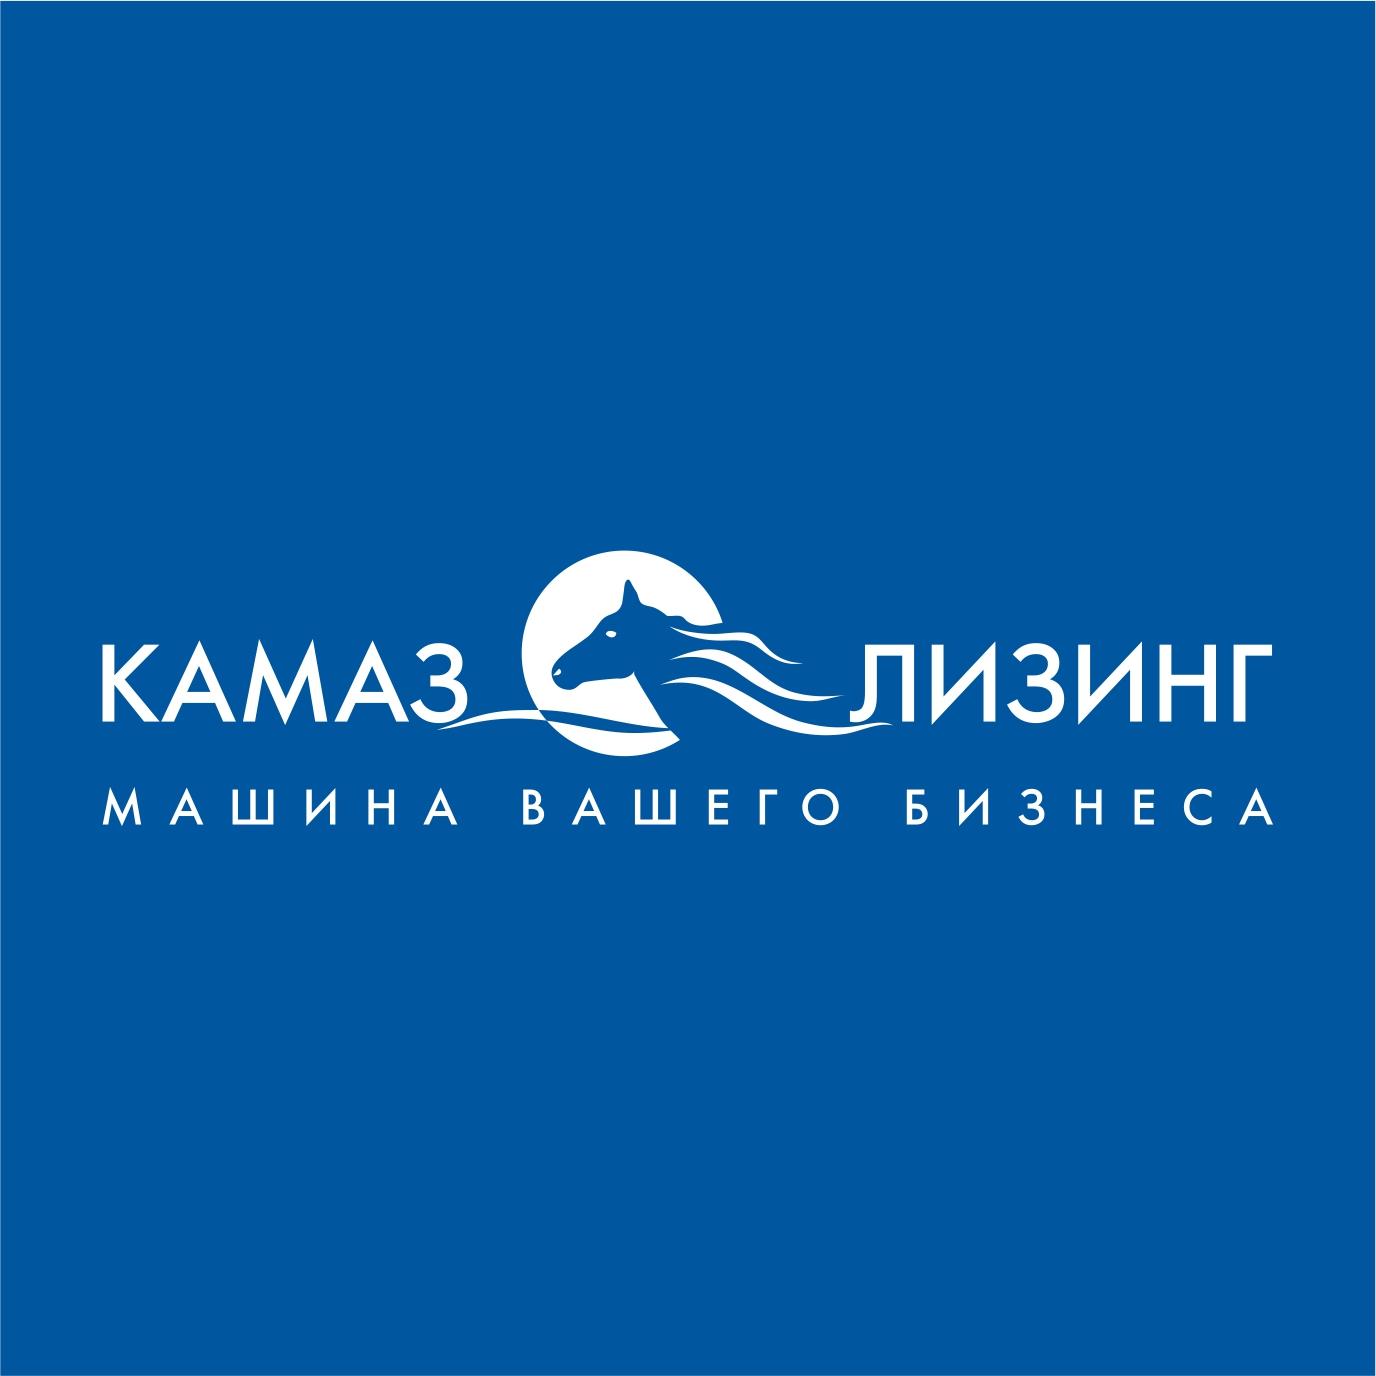 https://kamaz.ru/upload/iblock/95c/95ceb76ef55ccead9f19d9436b95d2ff.jpg